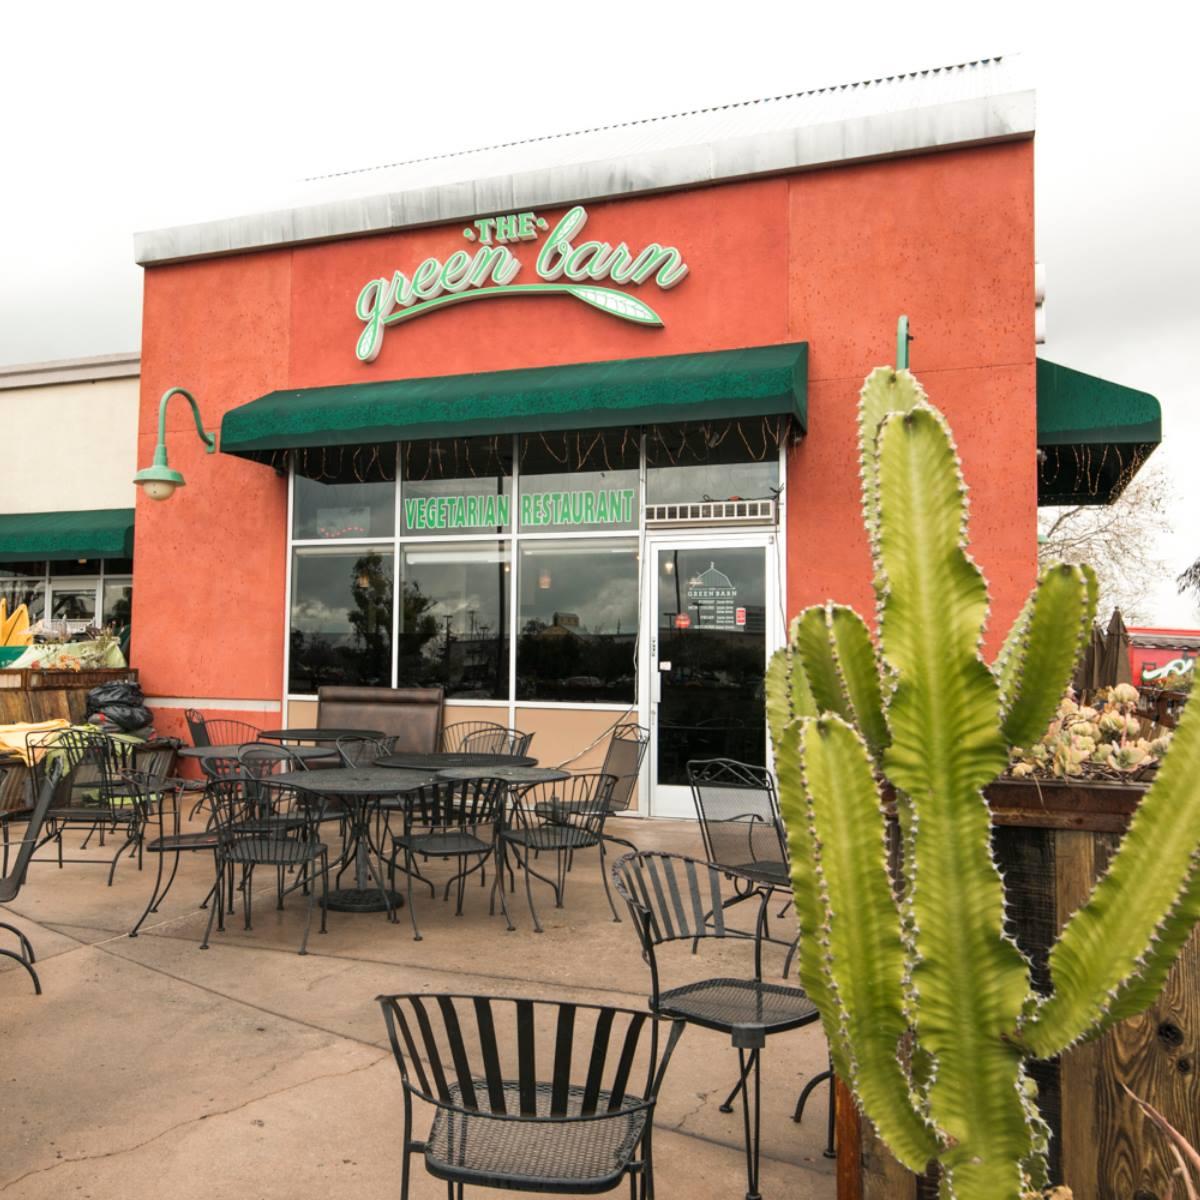 The Green Barn Restaurant 190 Ranch Dr, Milpitas